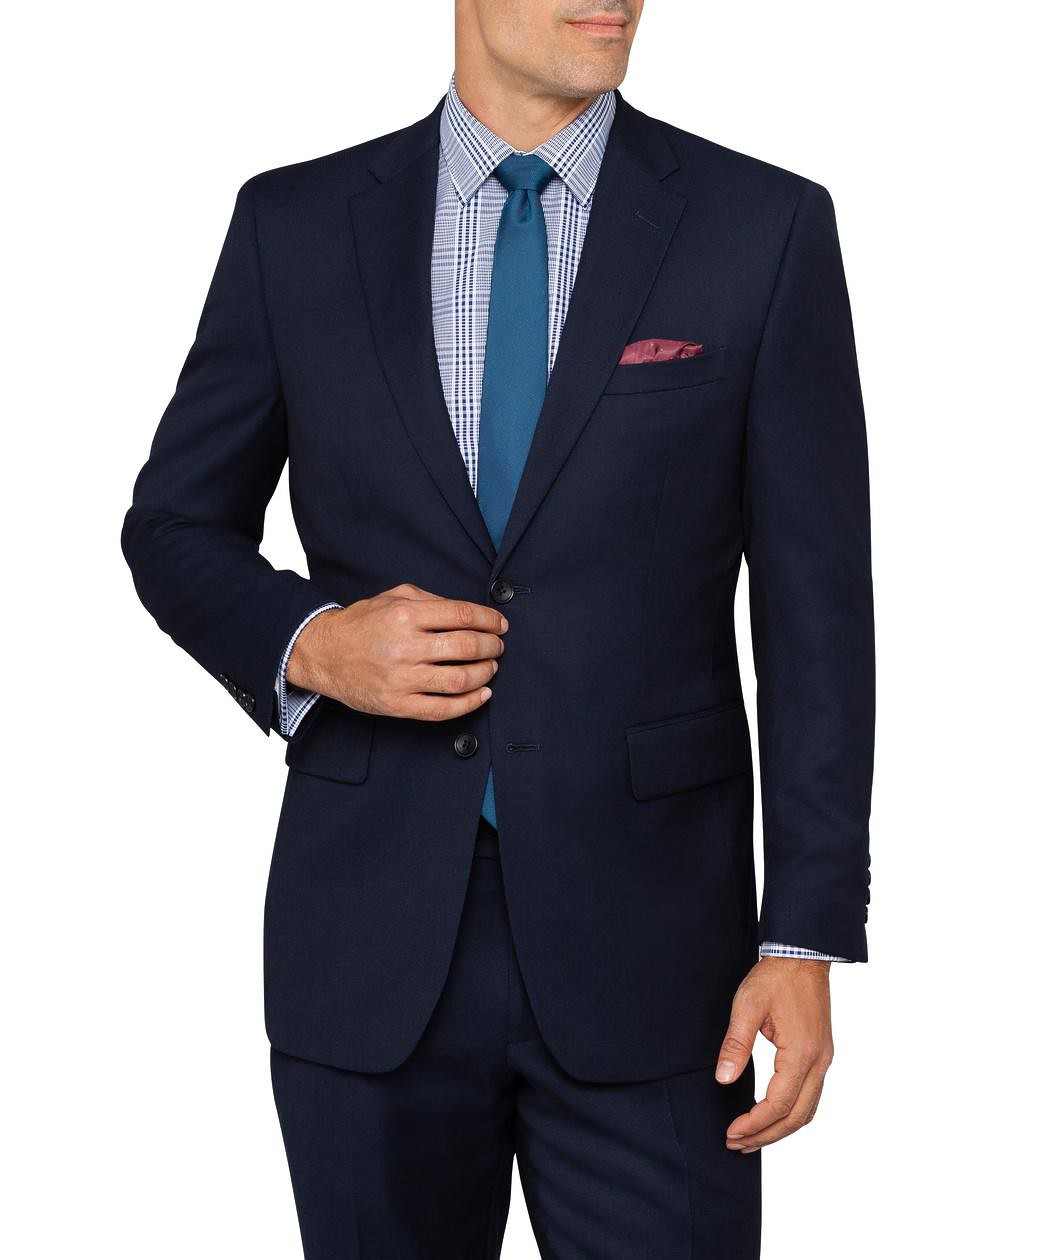 16042387b5a Van Heusen. Euro Tailored Fit Move Suit Jacket Navy